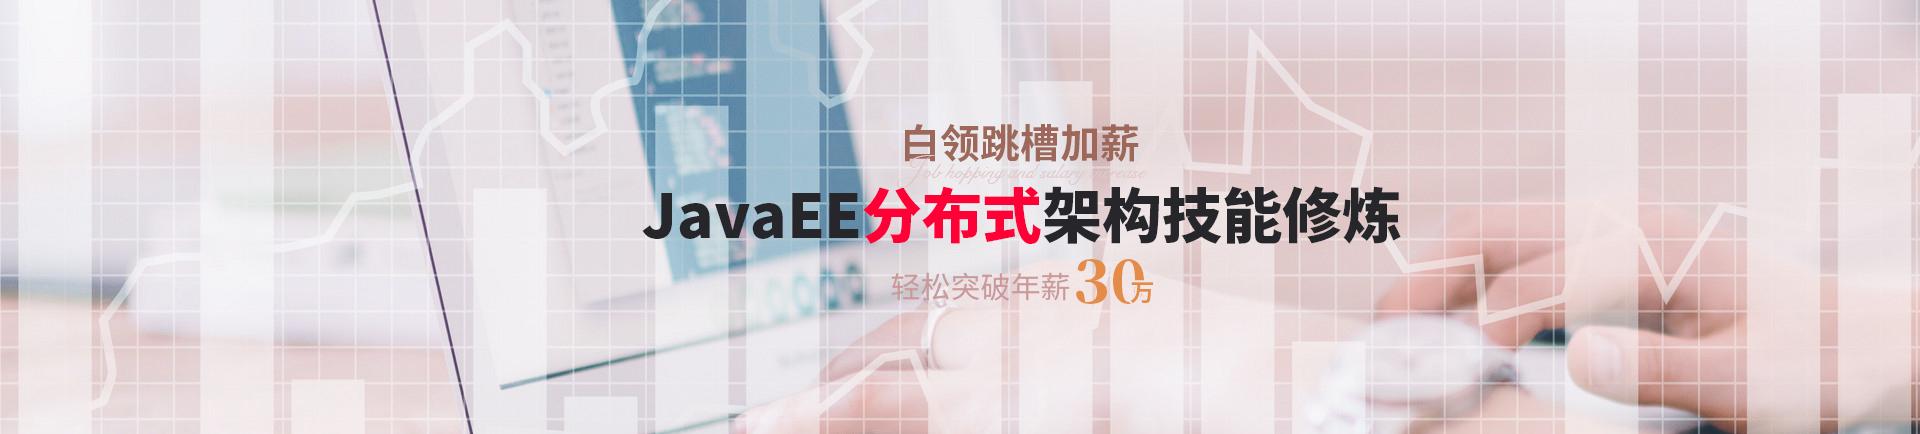 JavaEE分布�架构技能修炼 轻��破年薪30万-beijing